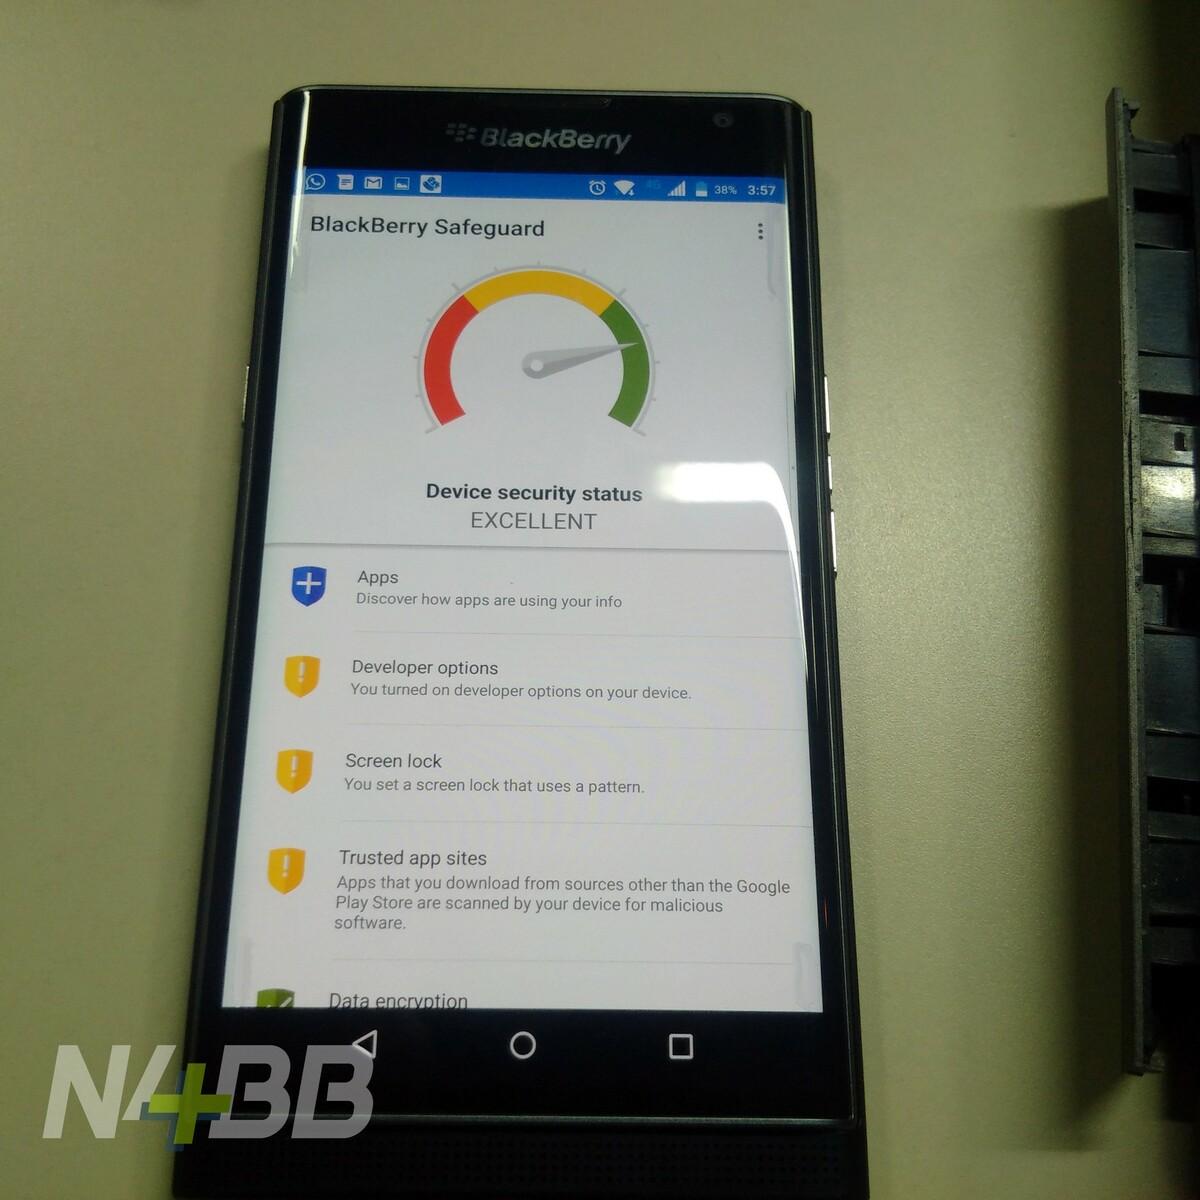 BlackBerry Safeguard